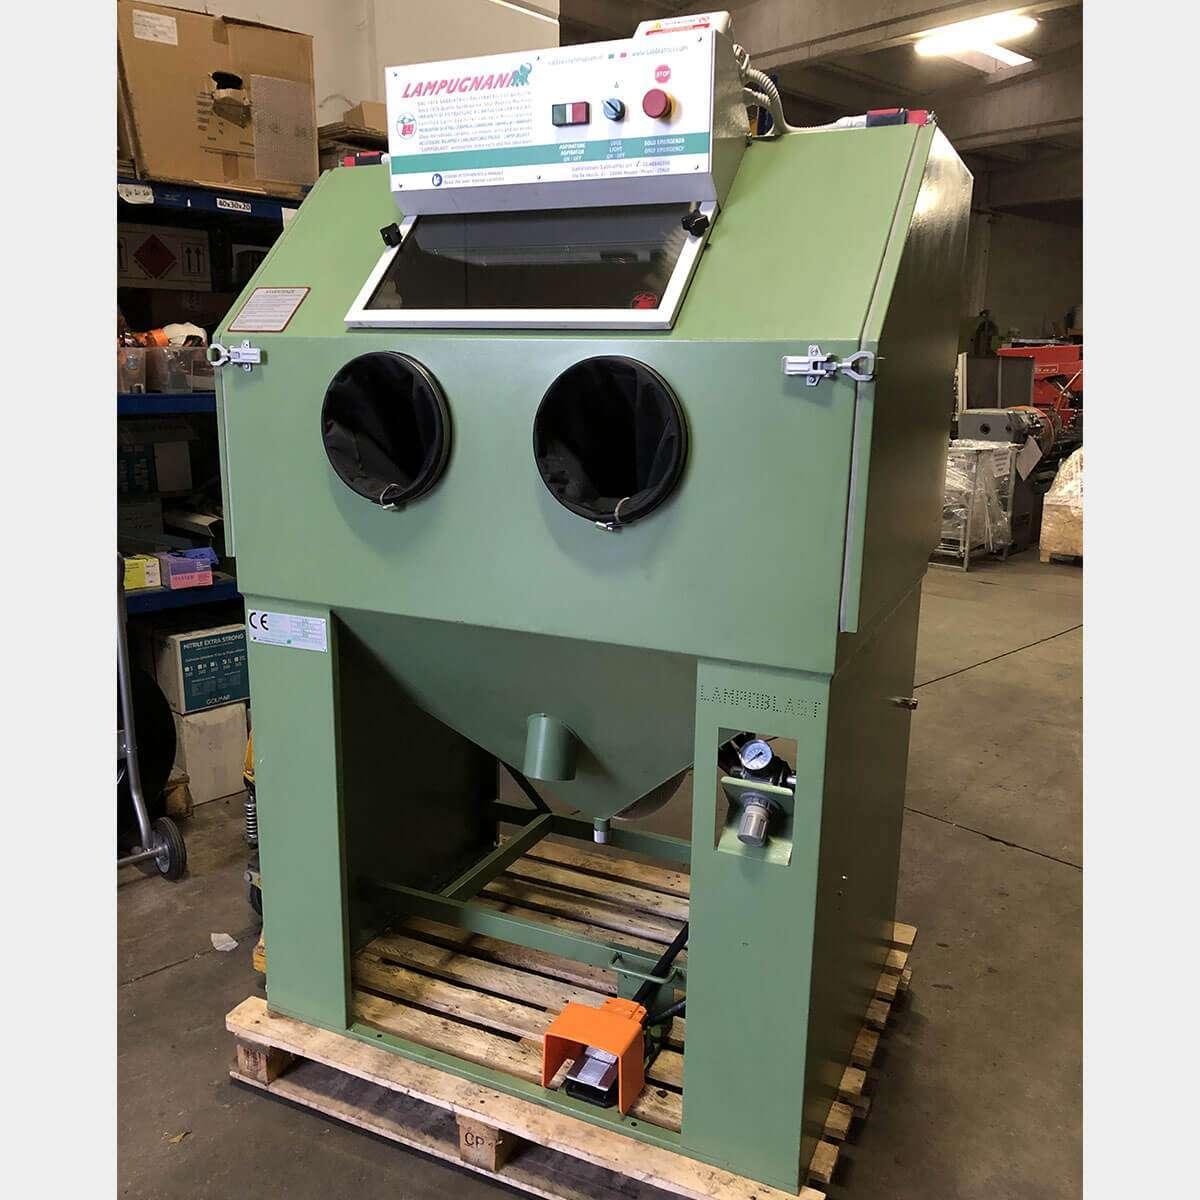 MU742 - LAMPUGNANI LC/2TR Sandblasting Machine